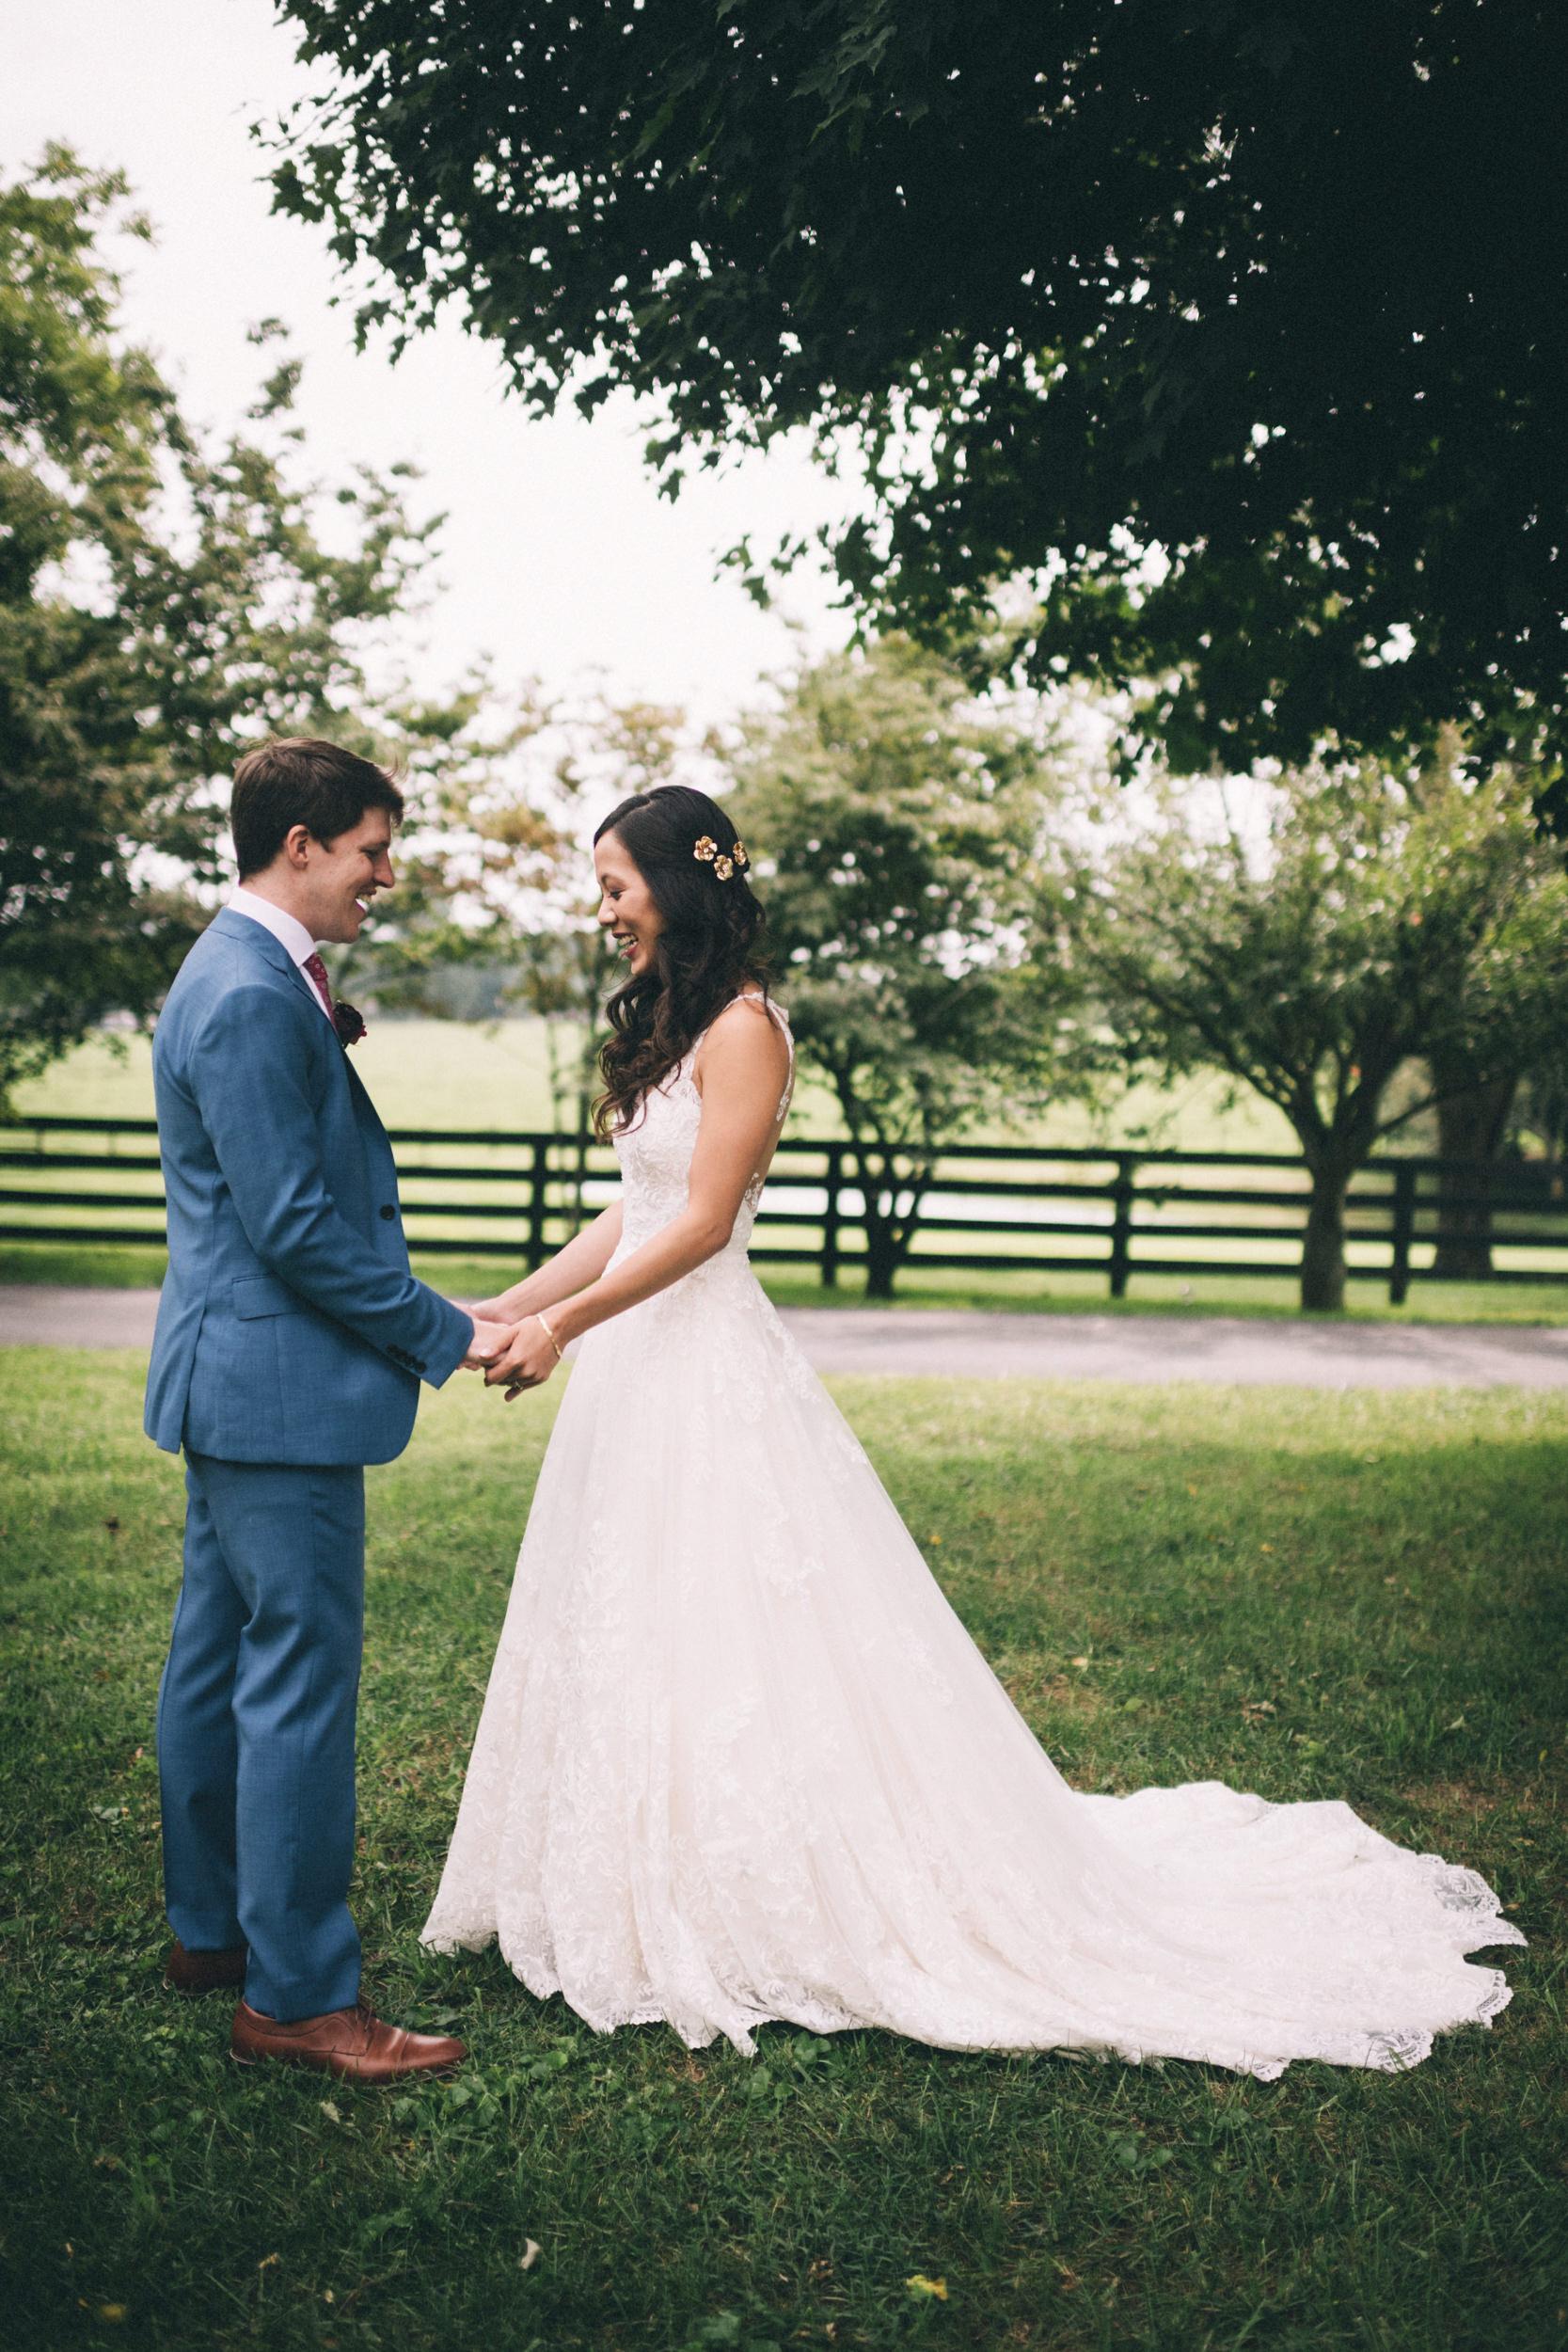 Louisville-Kentucky-Wedding-and-Elopement-Photographer-Sarah-Katherine-Davis-Photography-Summer-Jewel-Toned-Wedding-Chineese-Tea-Ceremony-Warrenwood-Manor-Danville-171.jpg